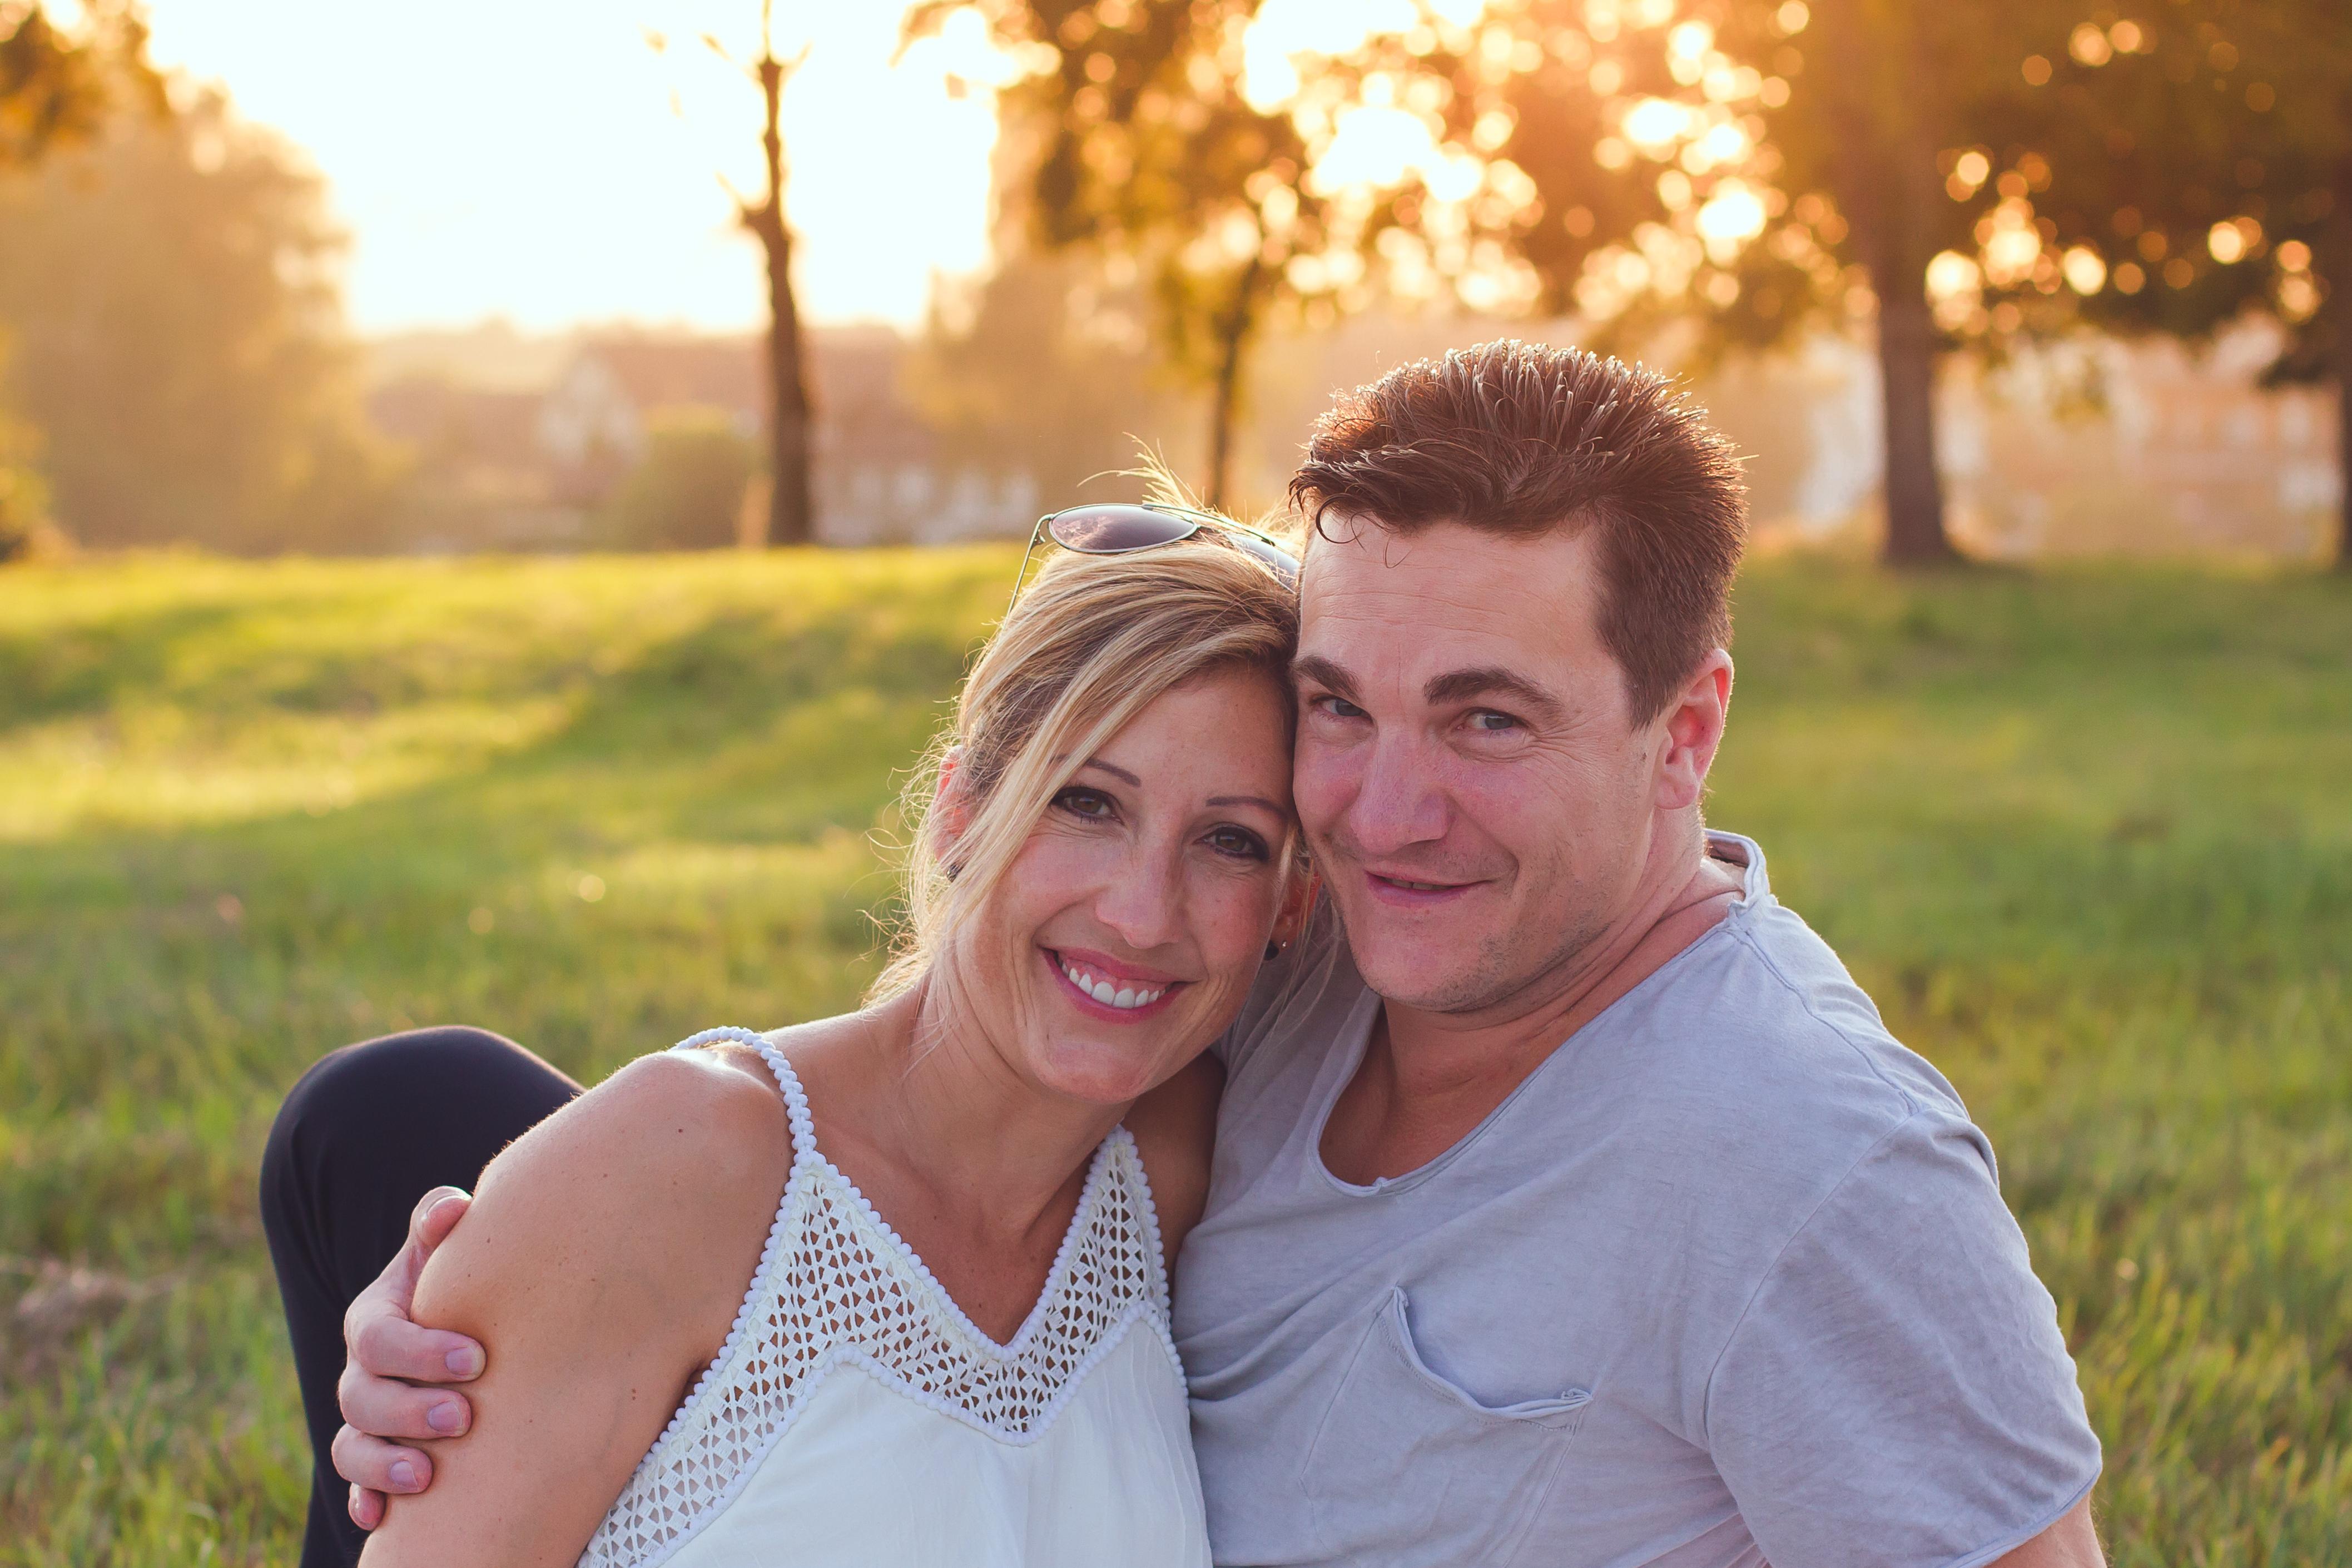 Partner, Familienfotografie